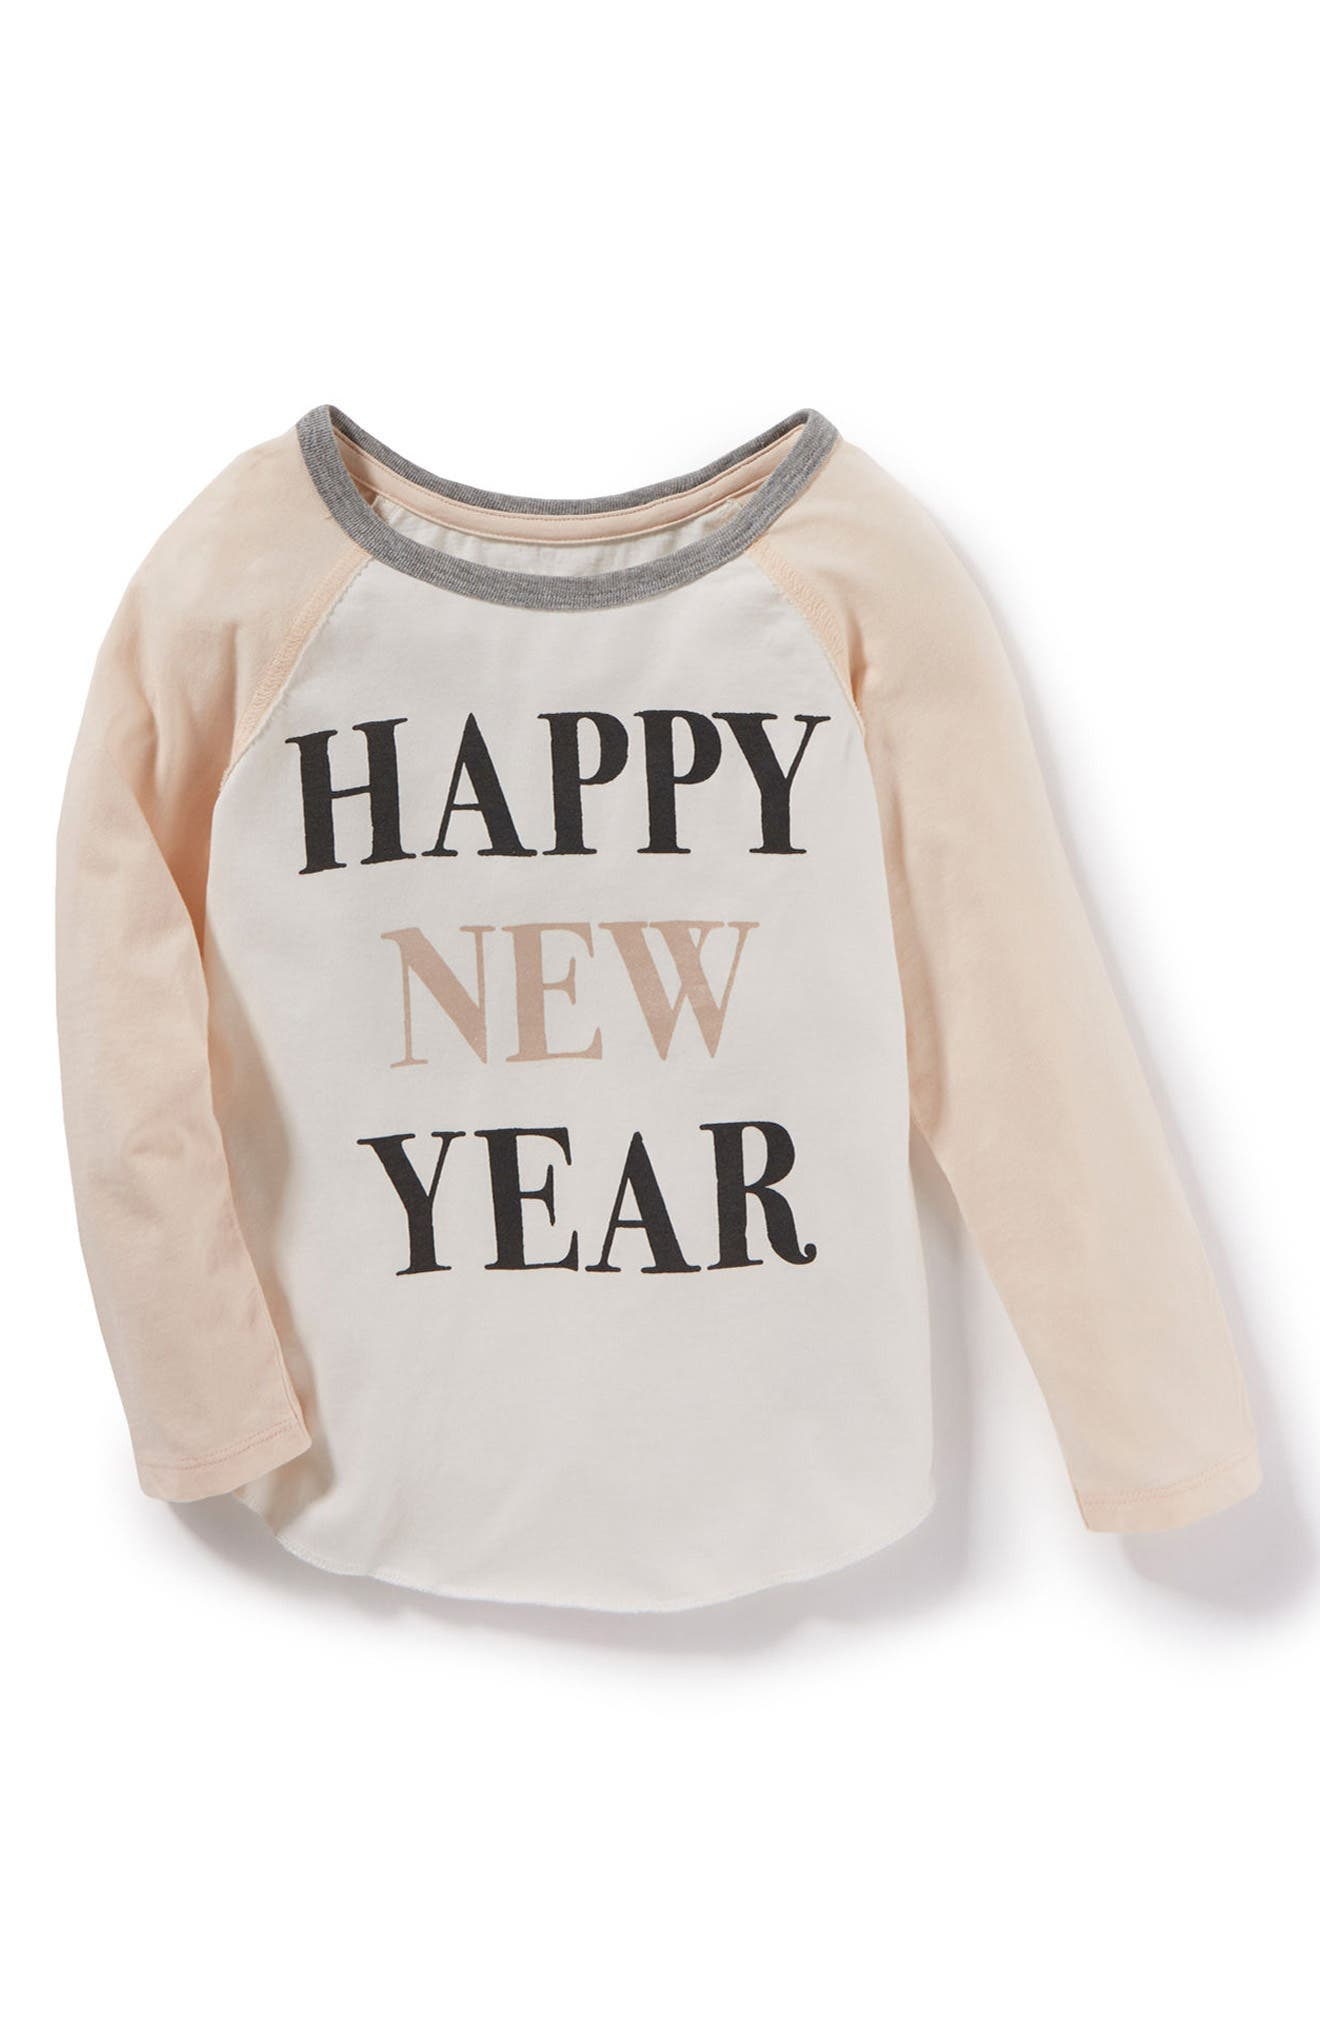 Alternate Image 1 Selected - Peek Happy New Year Graphic Tee (Toddler Girls, Little Girls & Big Girls)